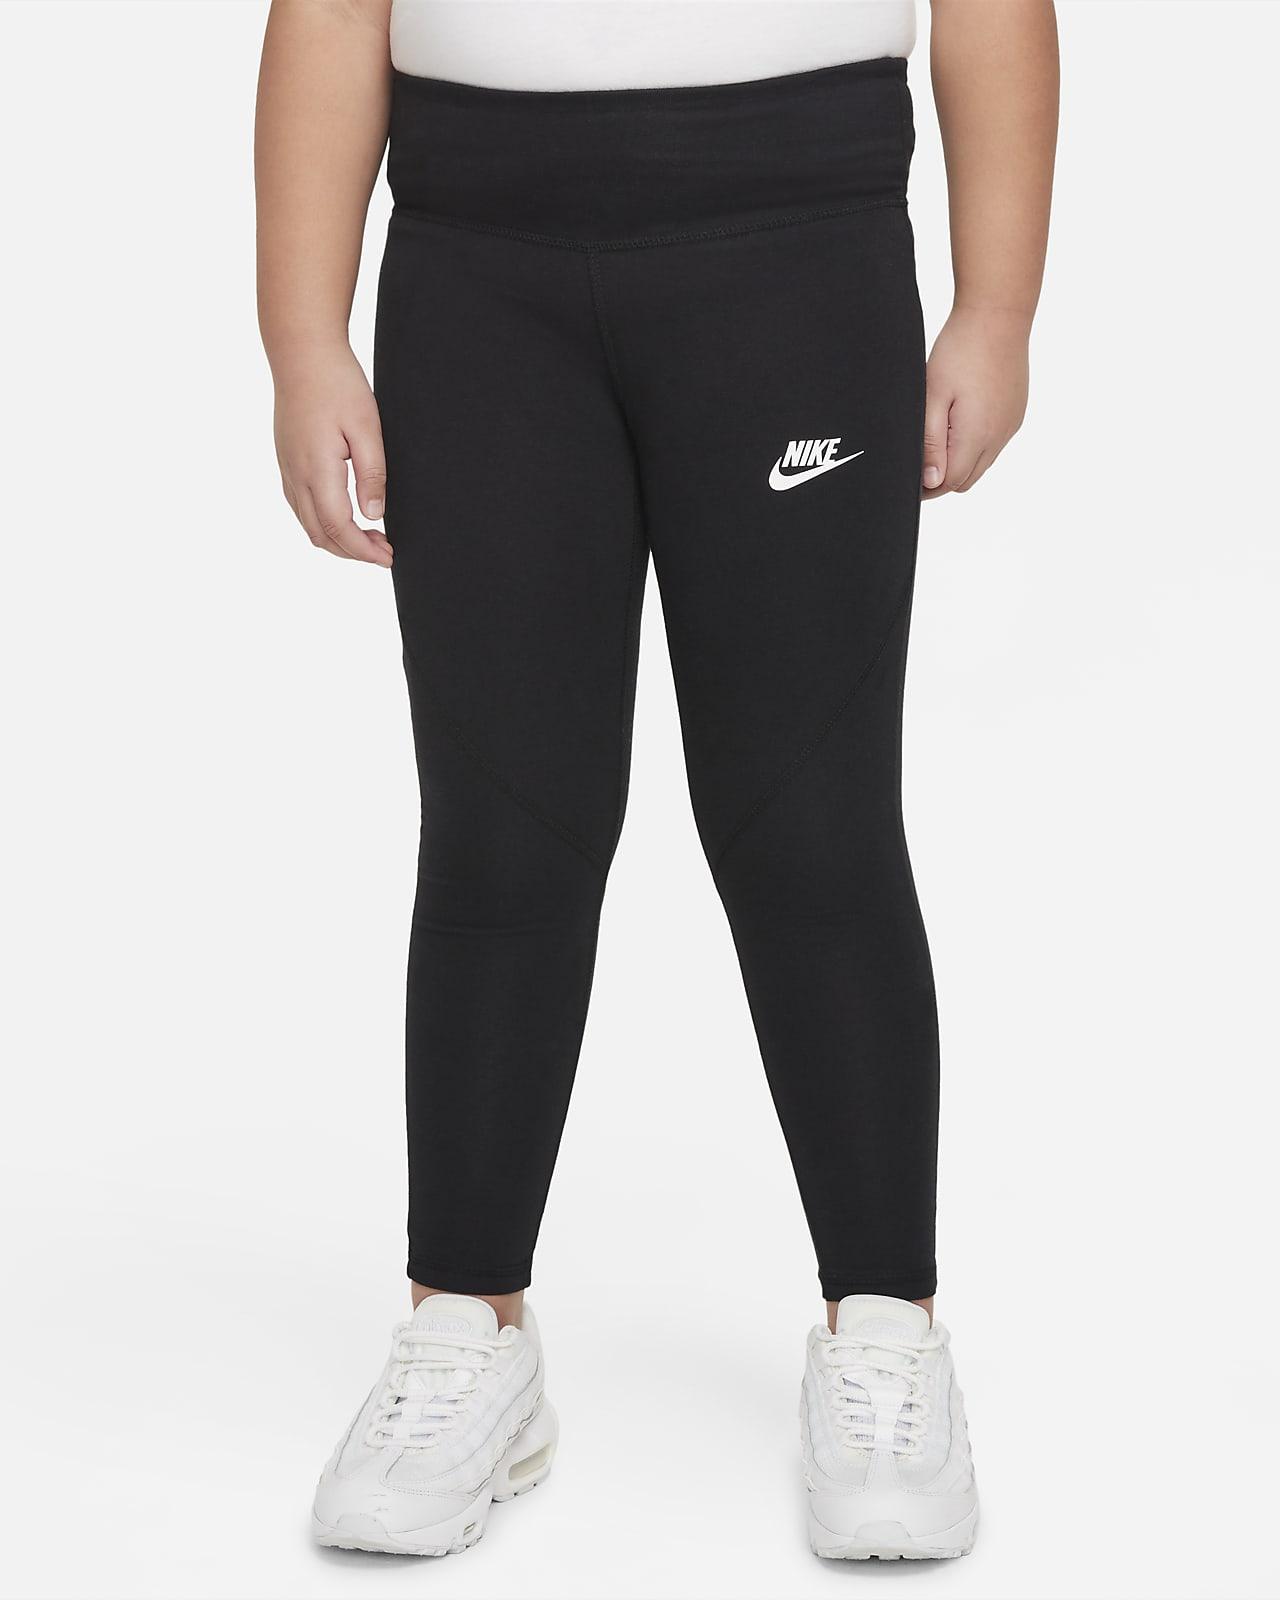 Nike Sportswear Favourites Older Kids' (Girls') High-Waisted Leggings (Extended Size)